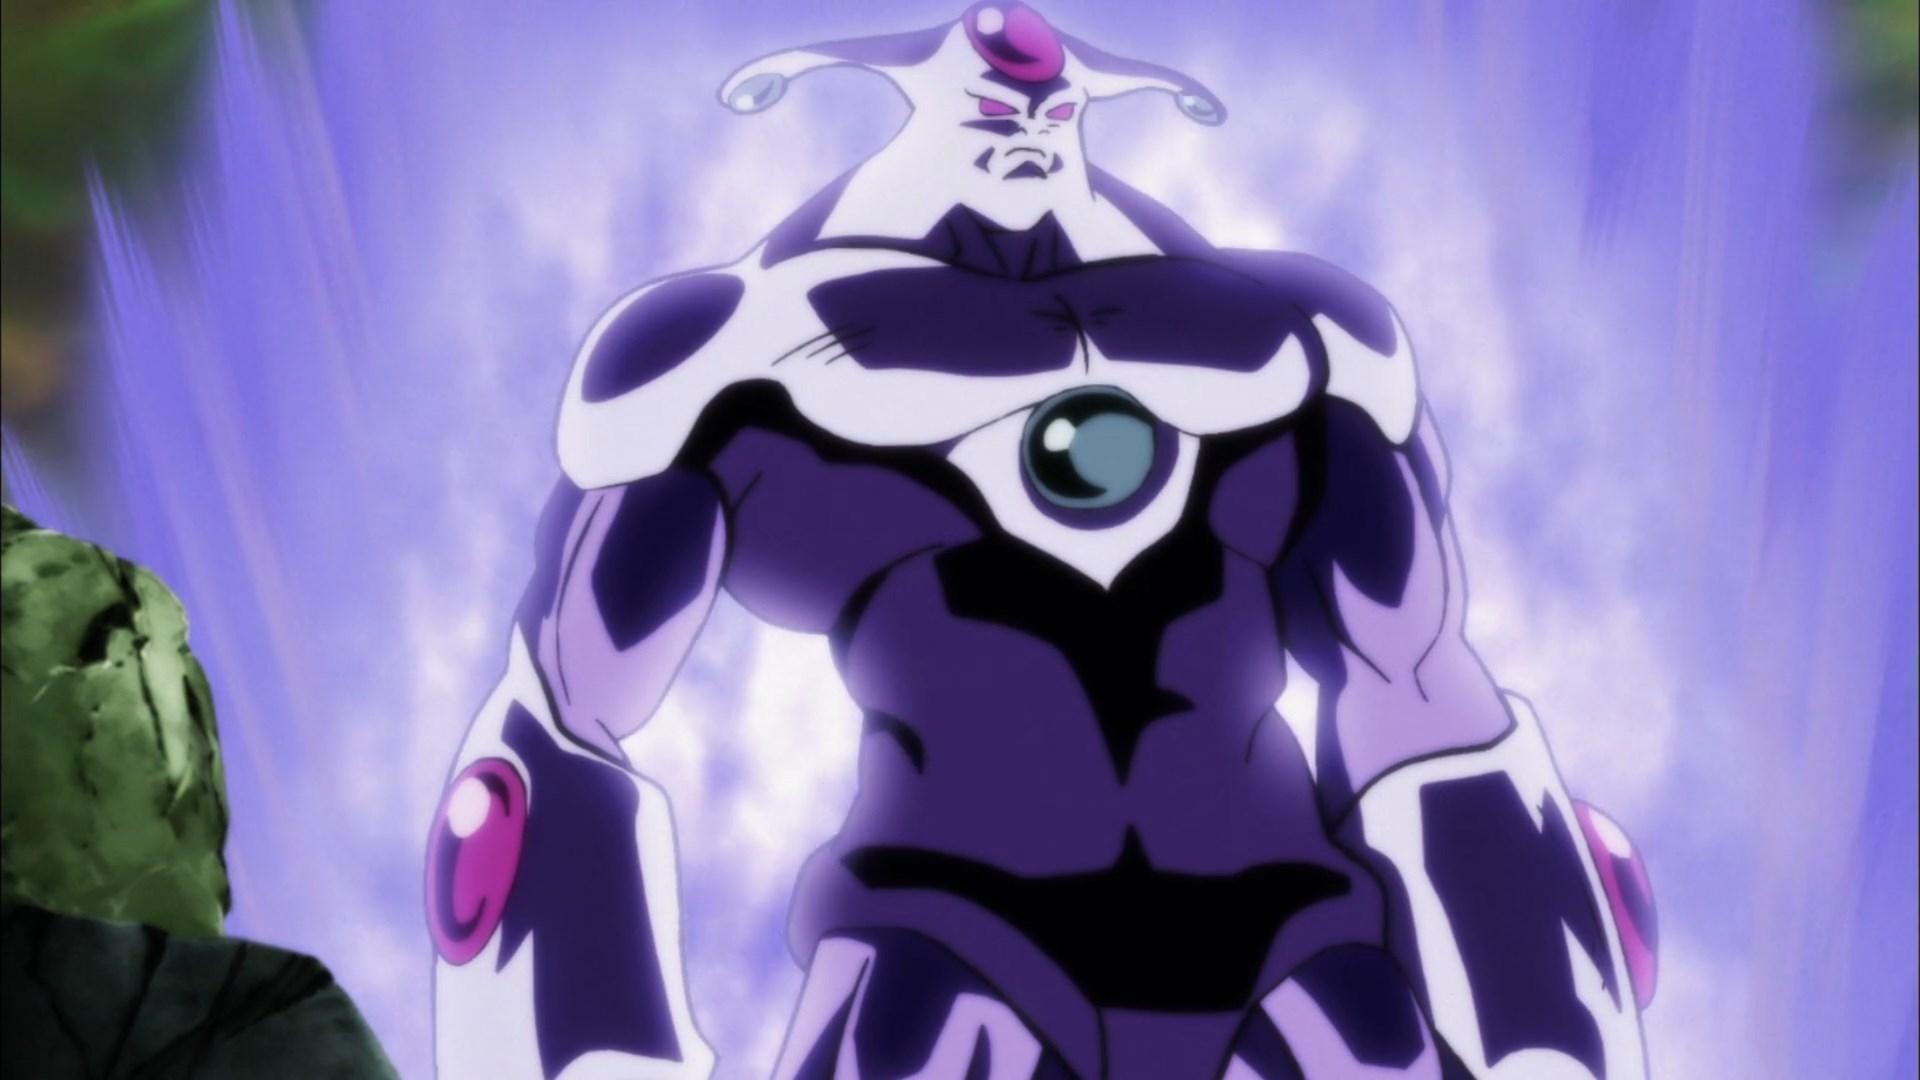 [HorribleSubs] Dragon Ball Super - 121 [1080p].mkv_snapshot_05.10